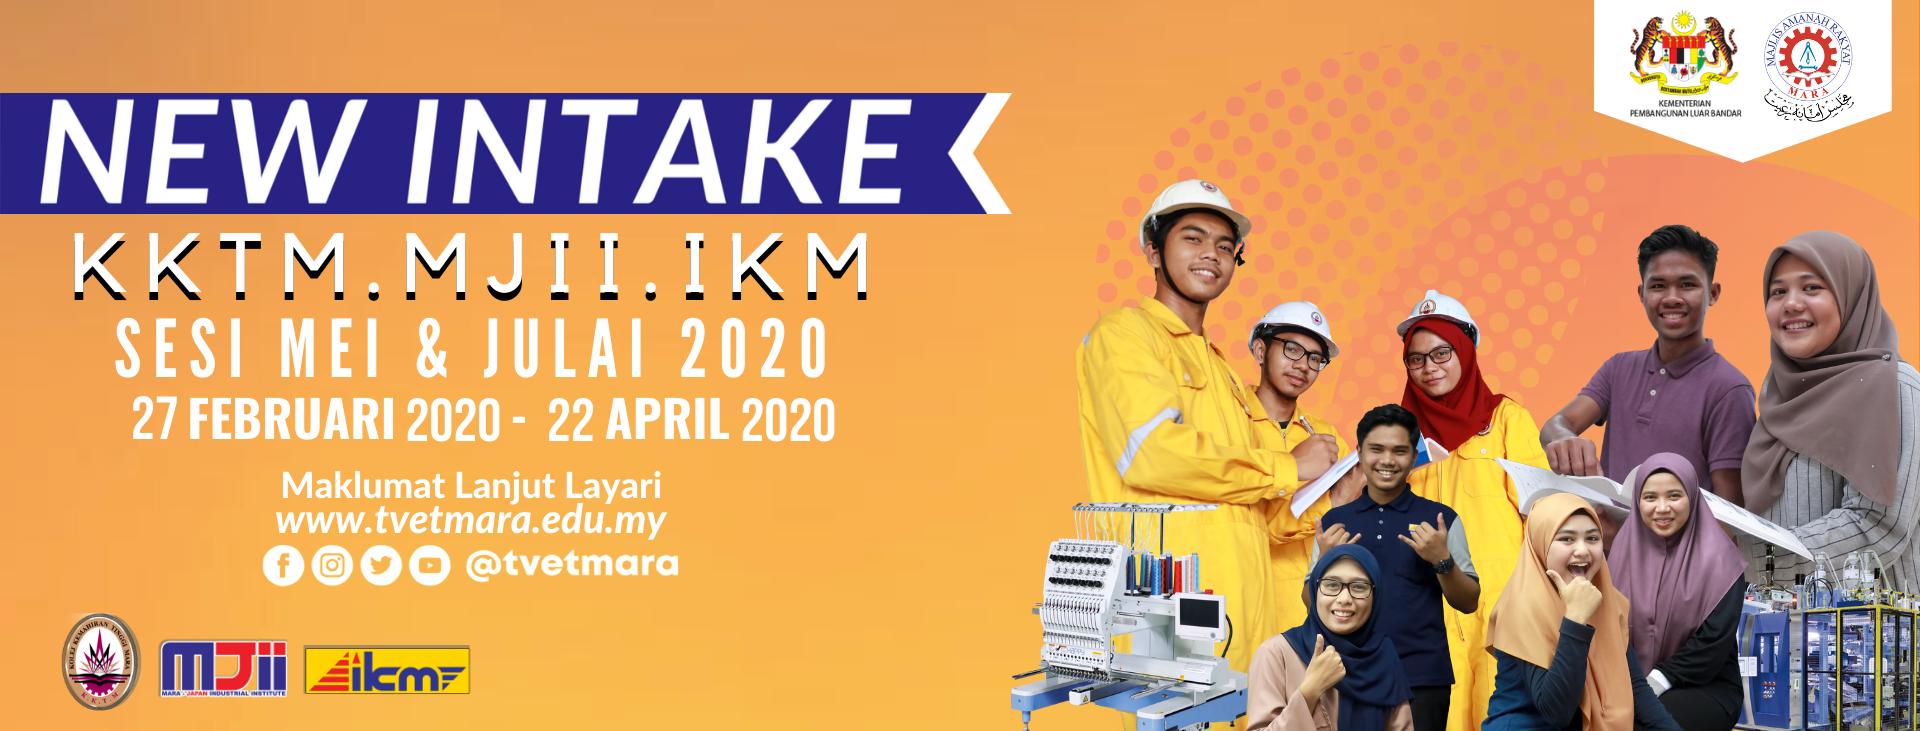 Borang Permohonan Online IKM KKTM & MJII 2020